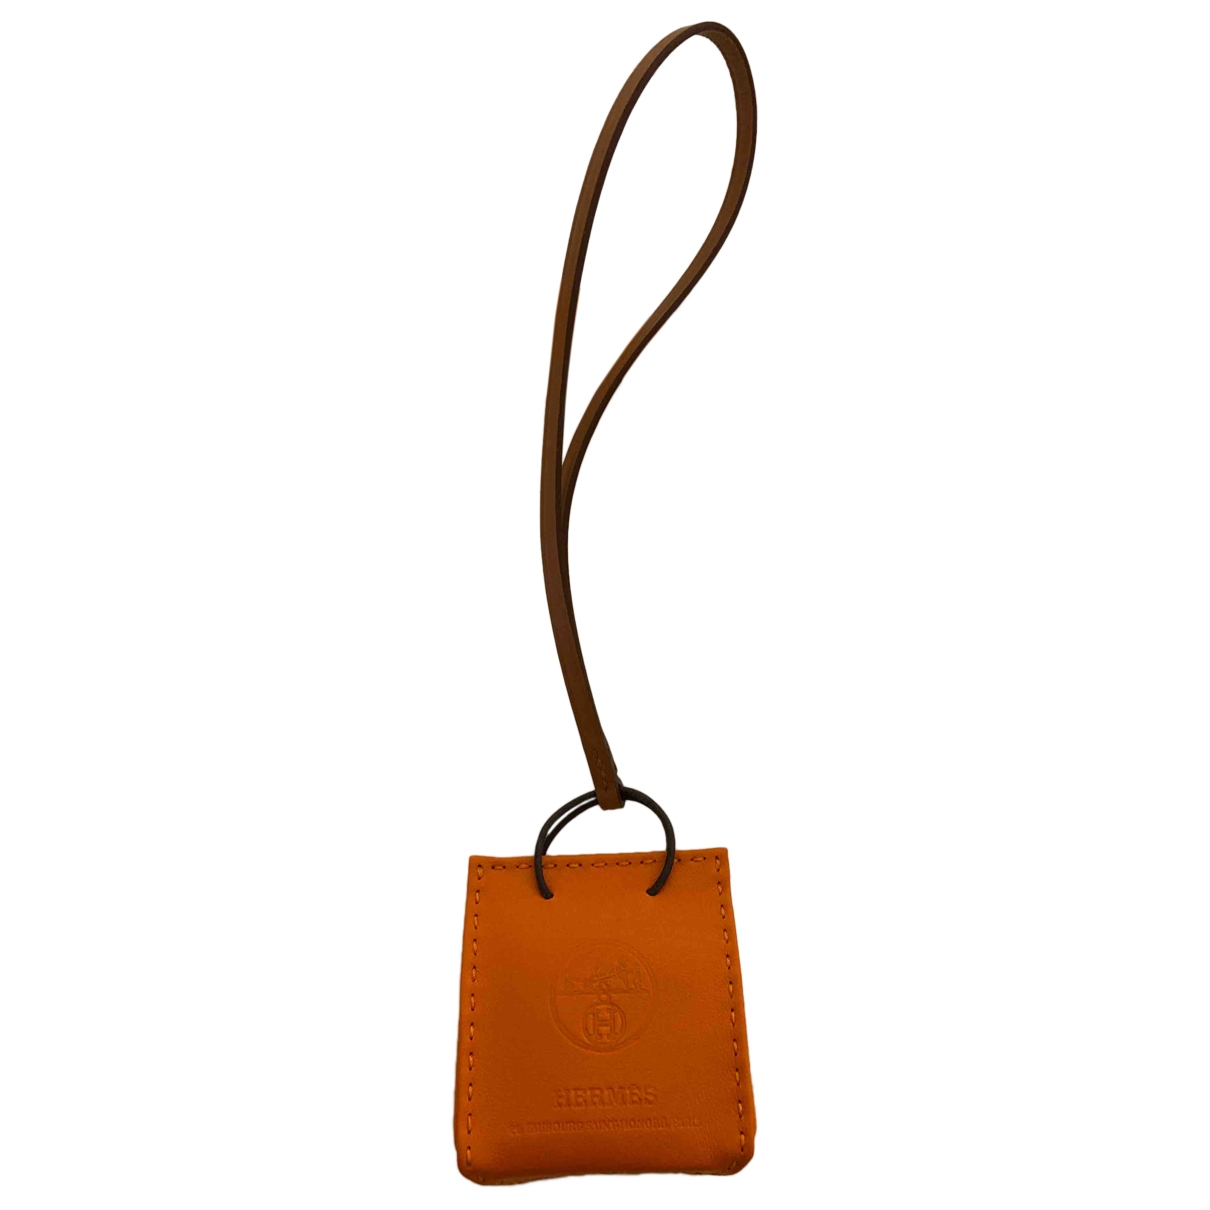 Hermès Shopping bag charm Orange Leather Bag charms for Women \N